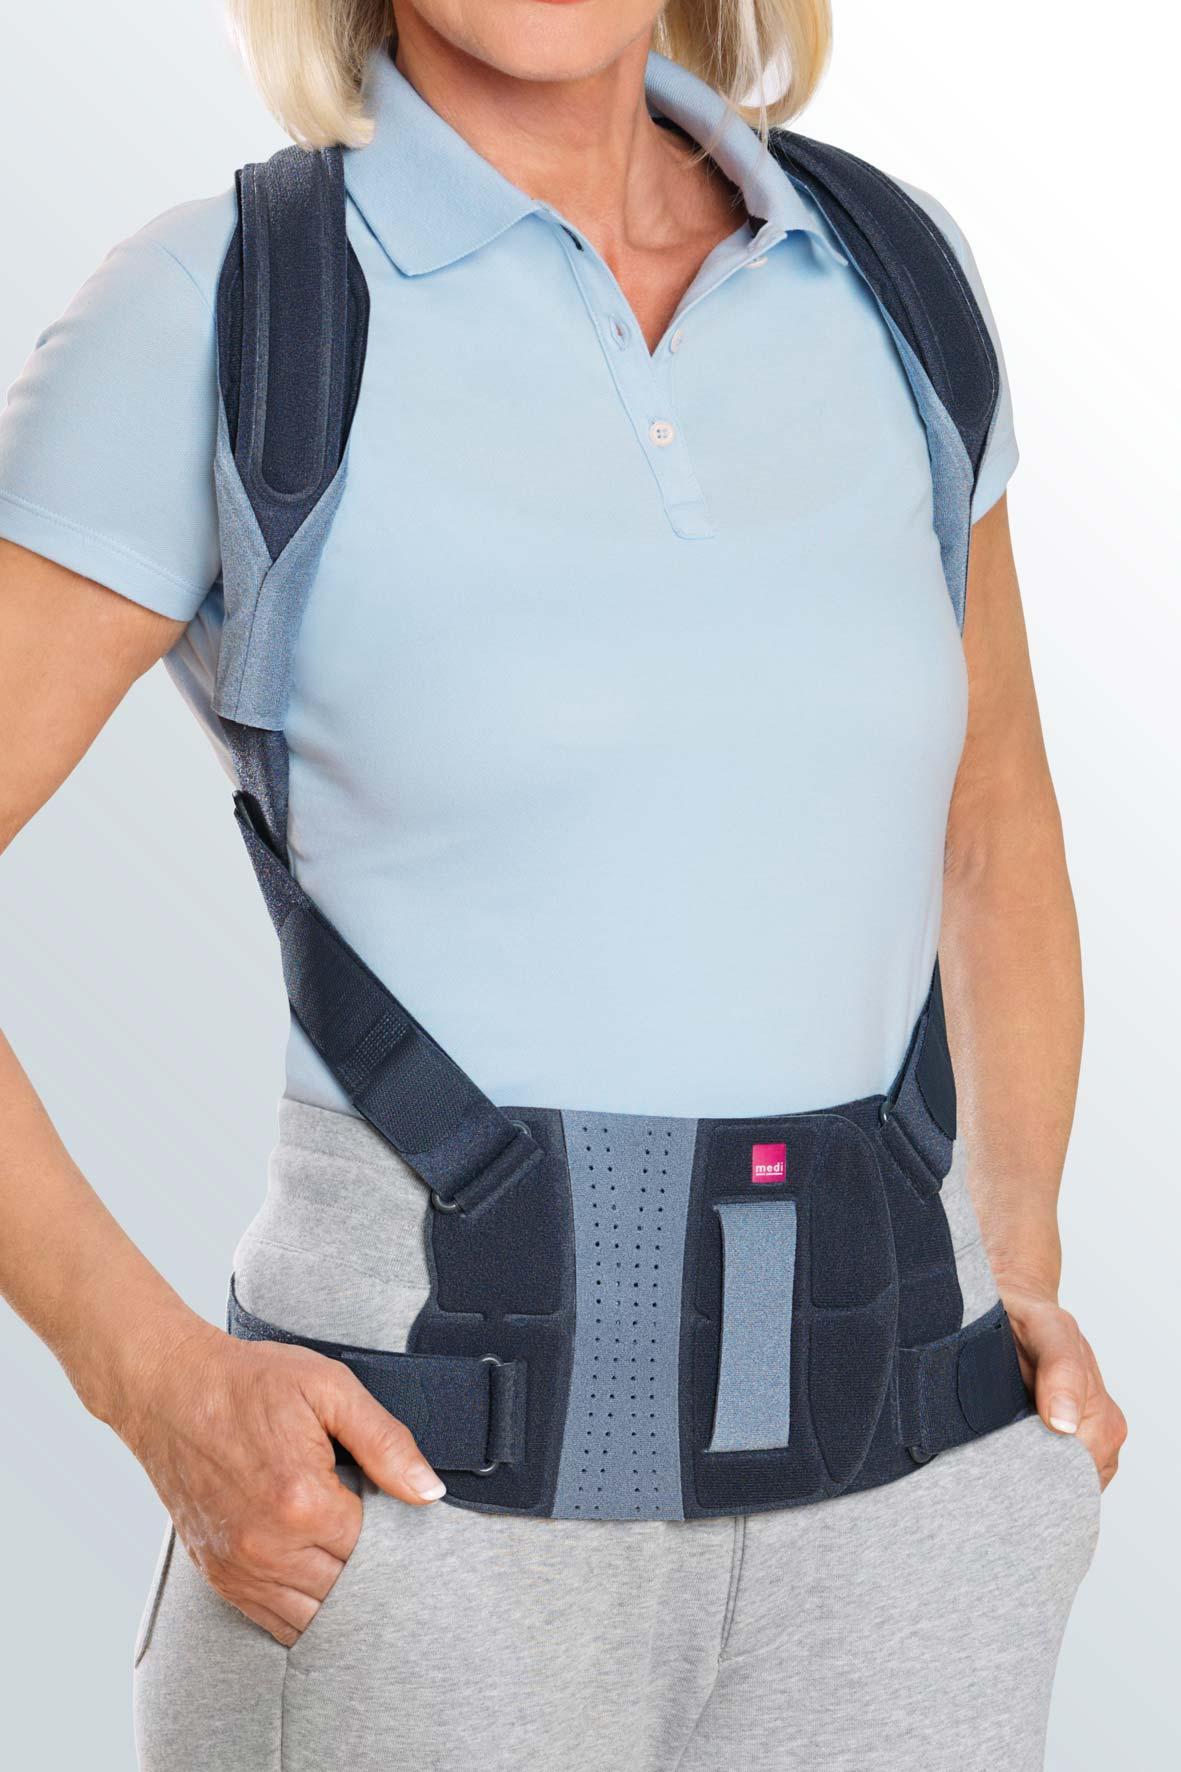 Spinomed Iv Spinal Brace Medi Orthopedics P Amp H Services